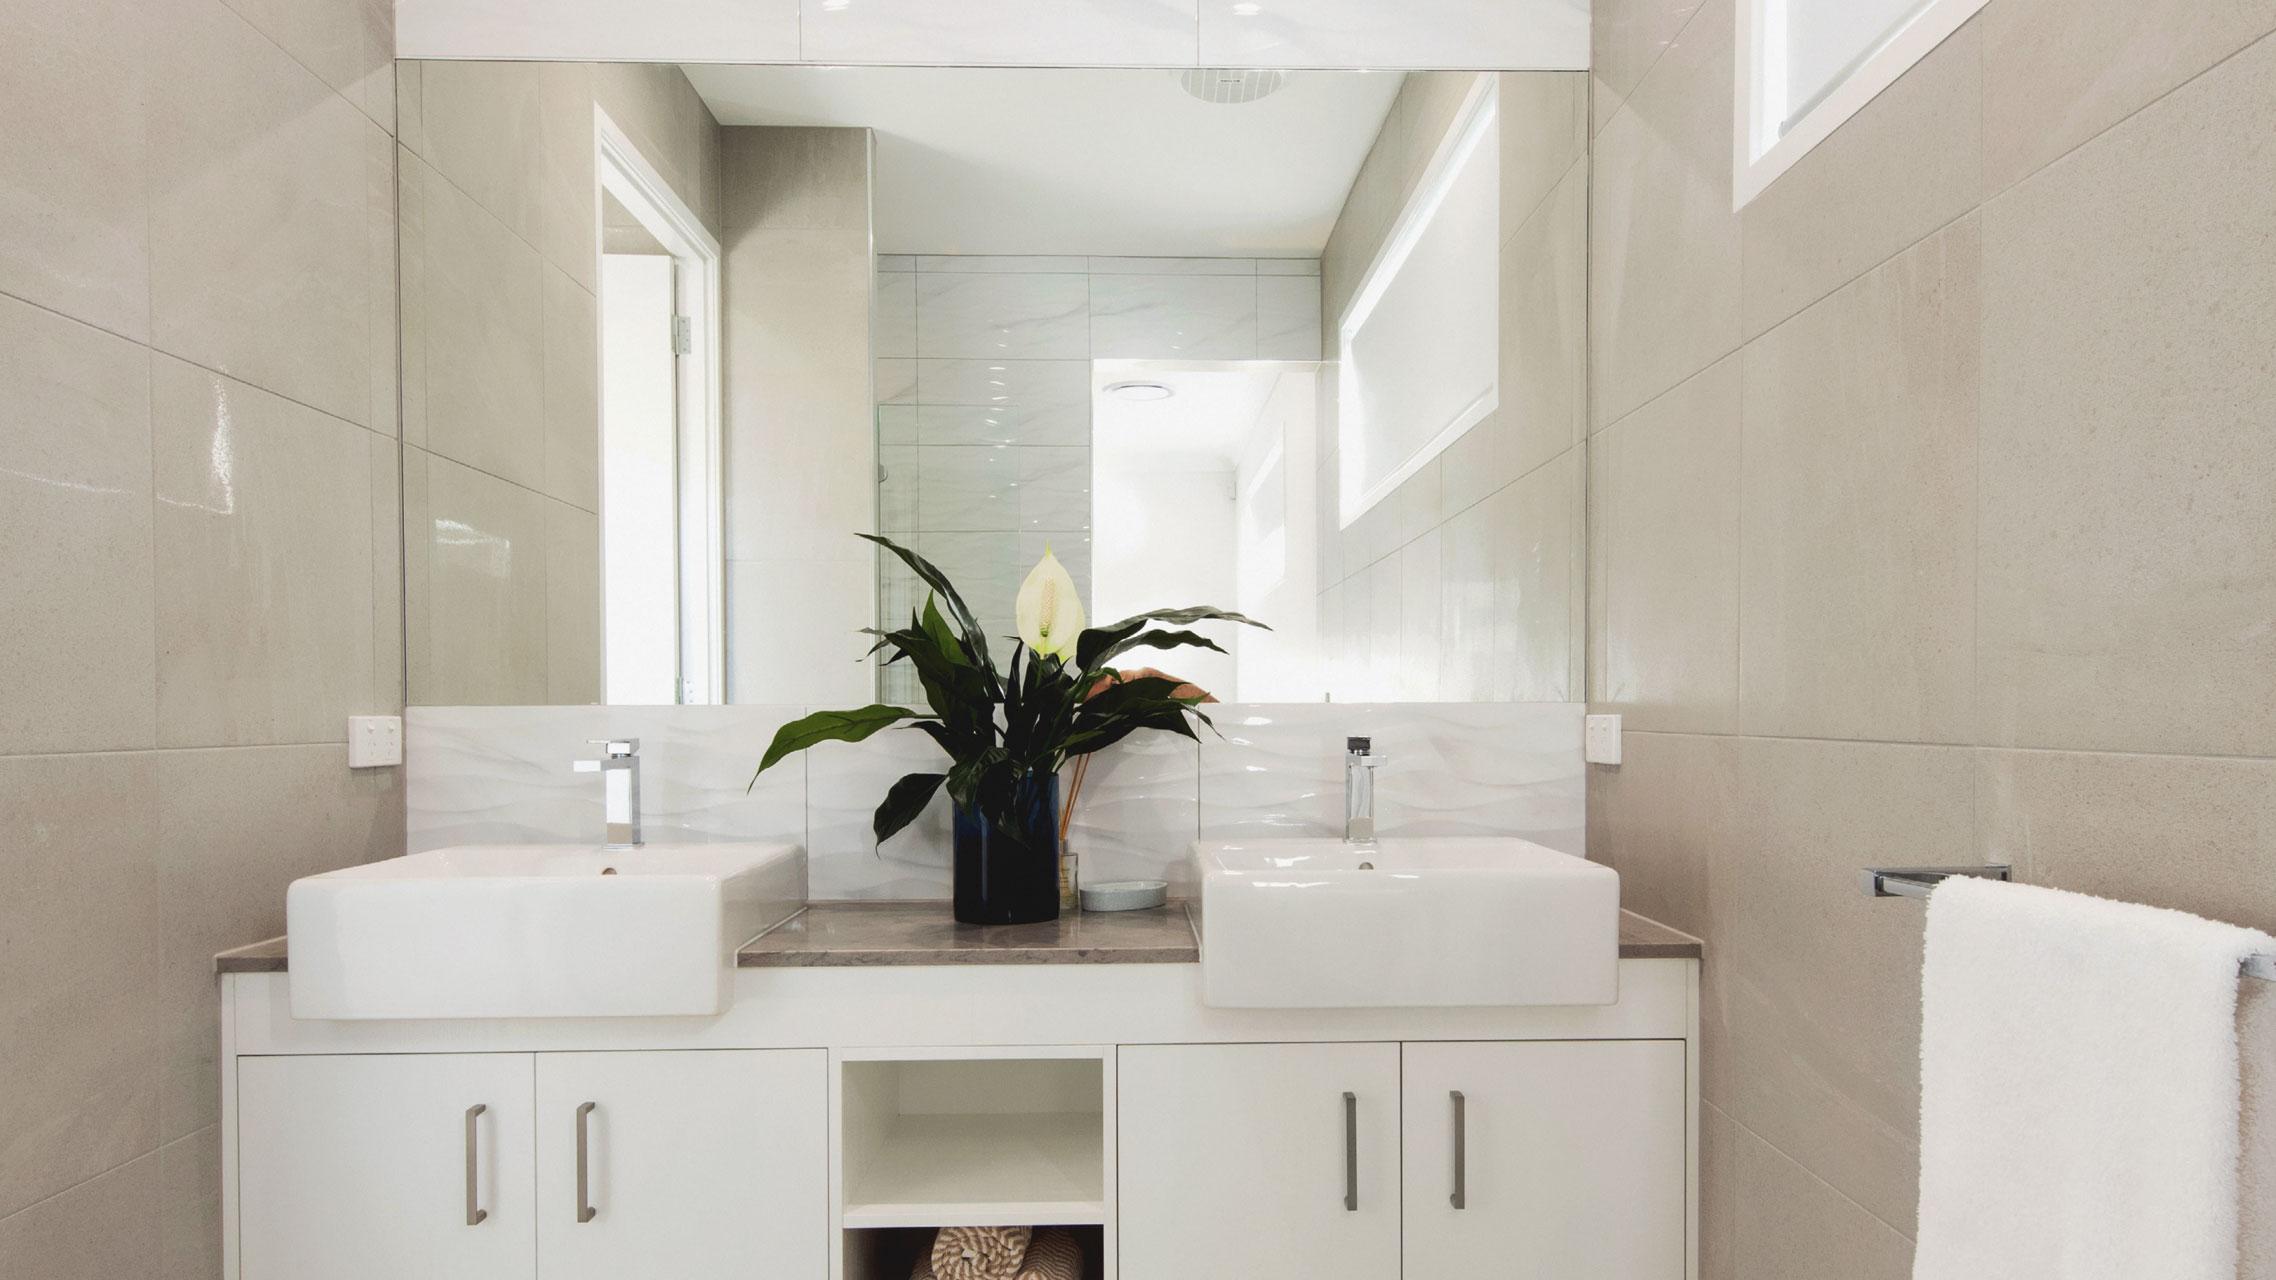 Semi-frameless Bathroom Mirror above a vanity